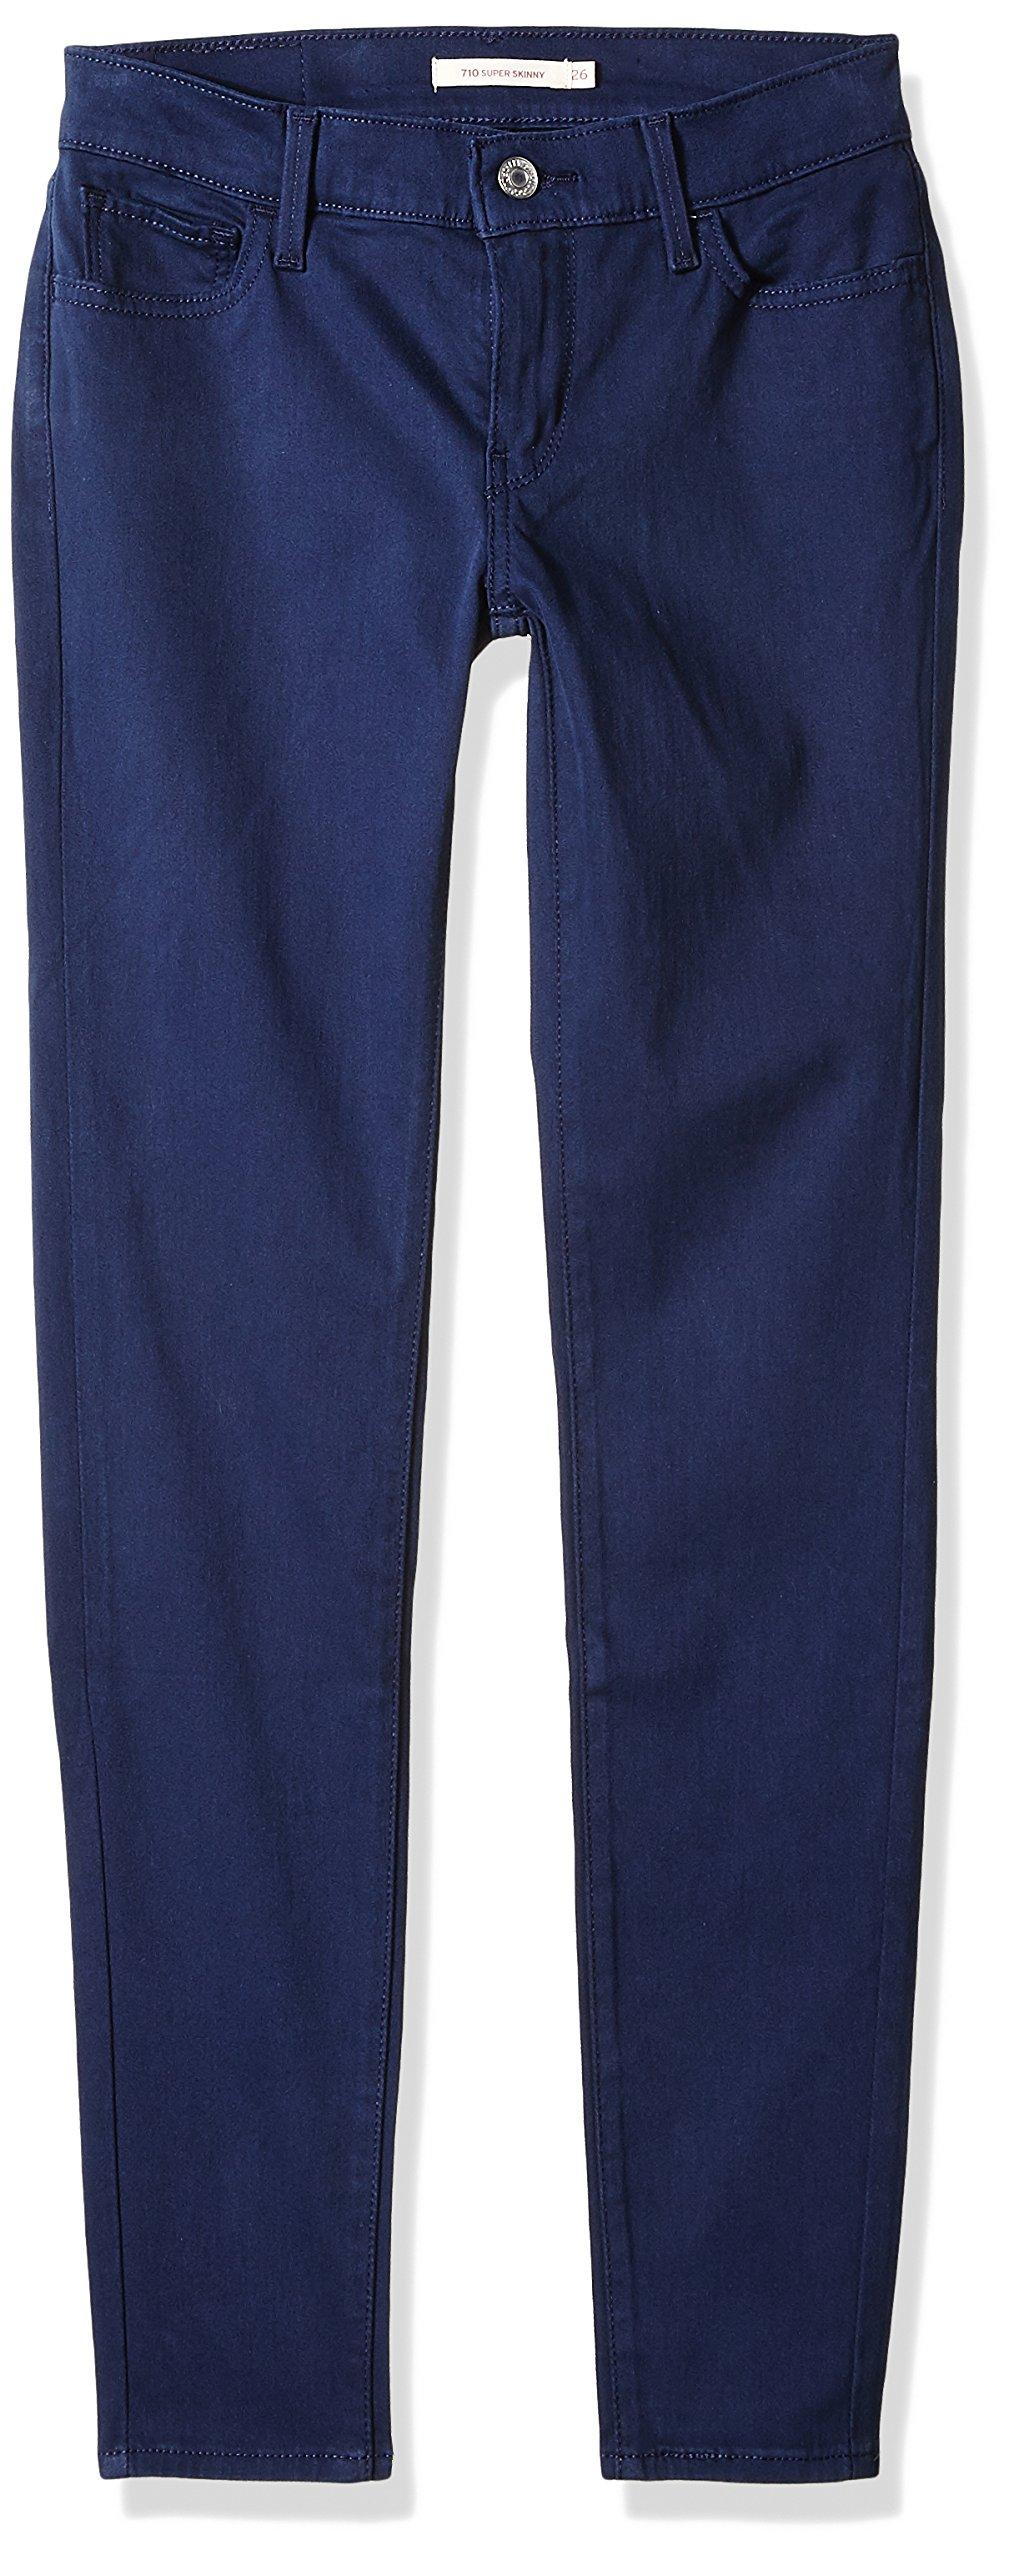 Levi's Women's 710 Super Skinny Jeans, Super Soft Navy Blazer, 33 (US 16) R